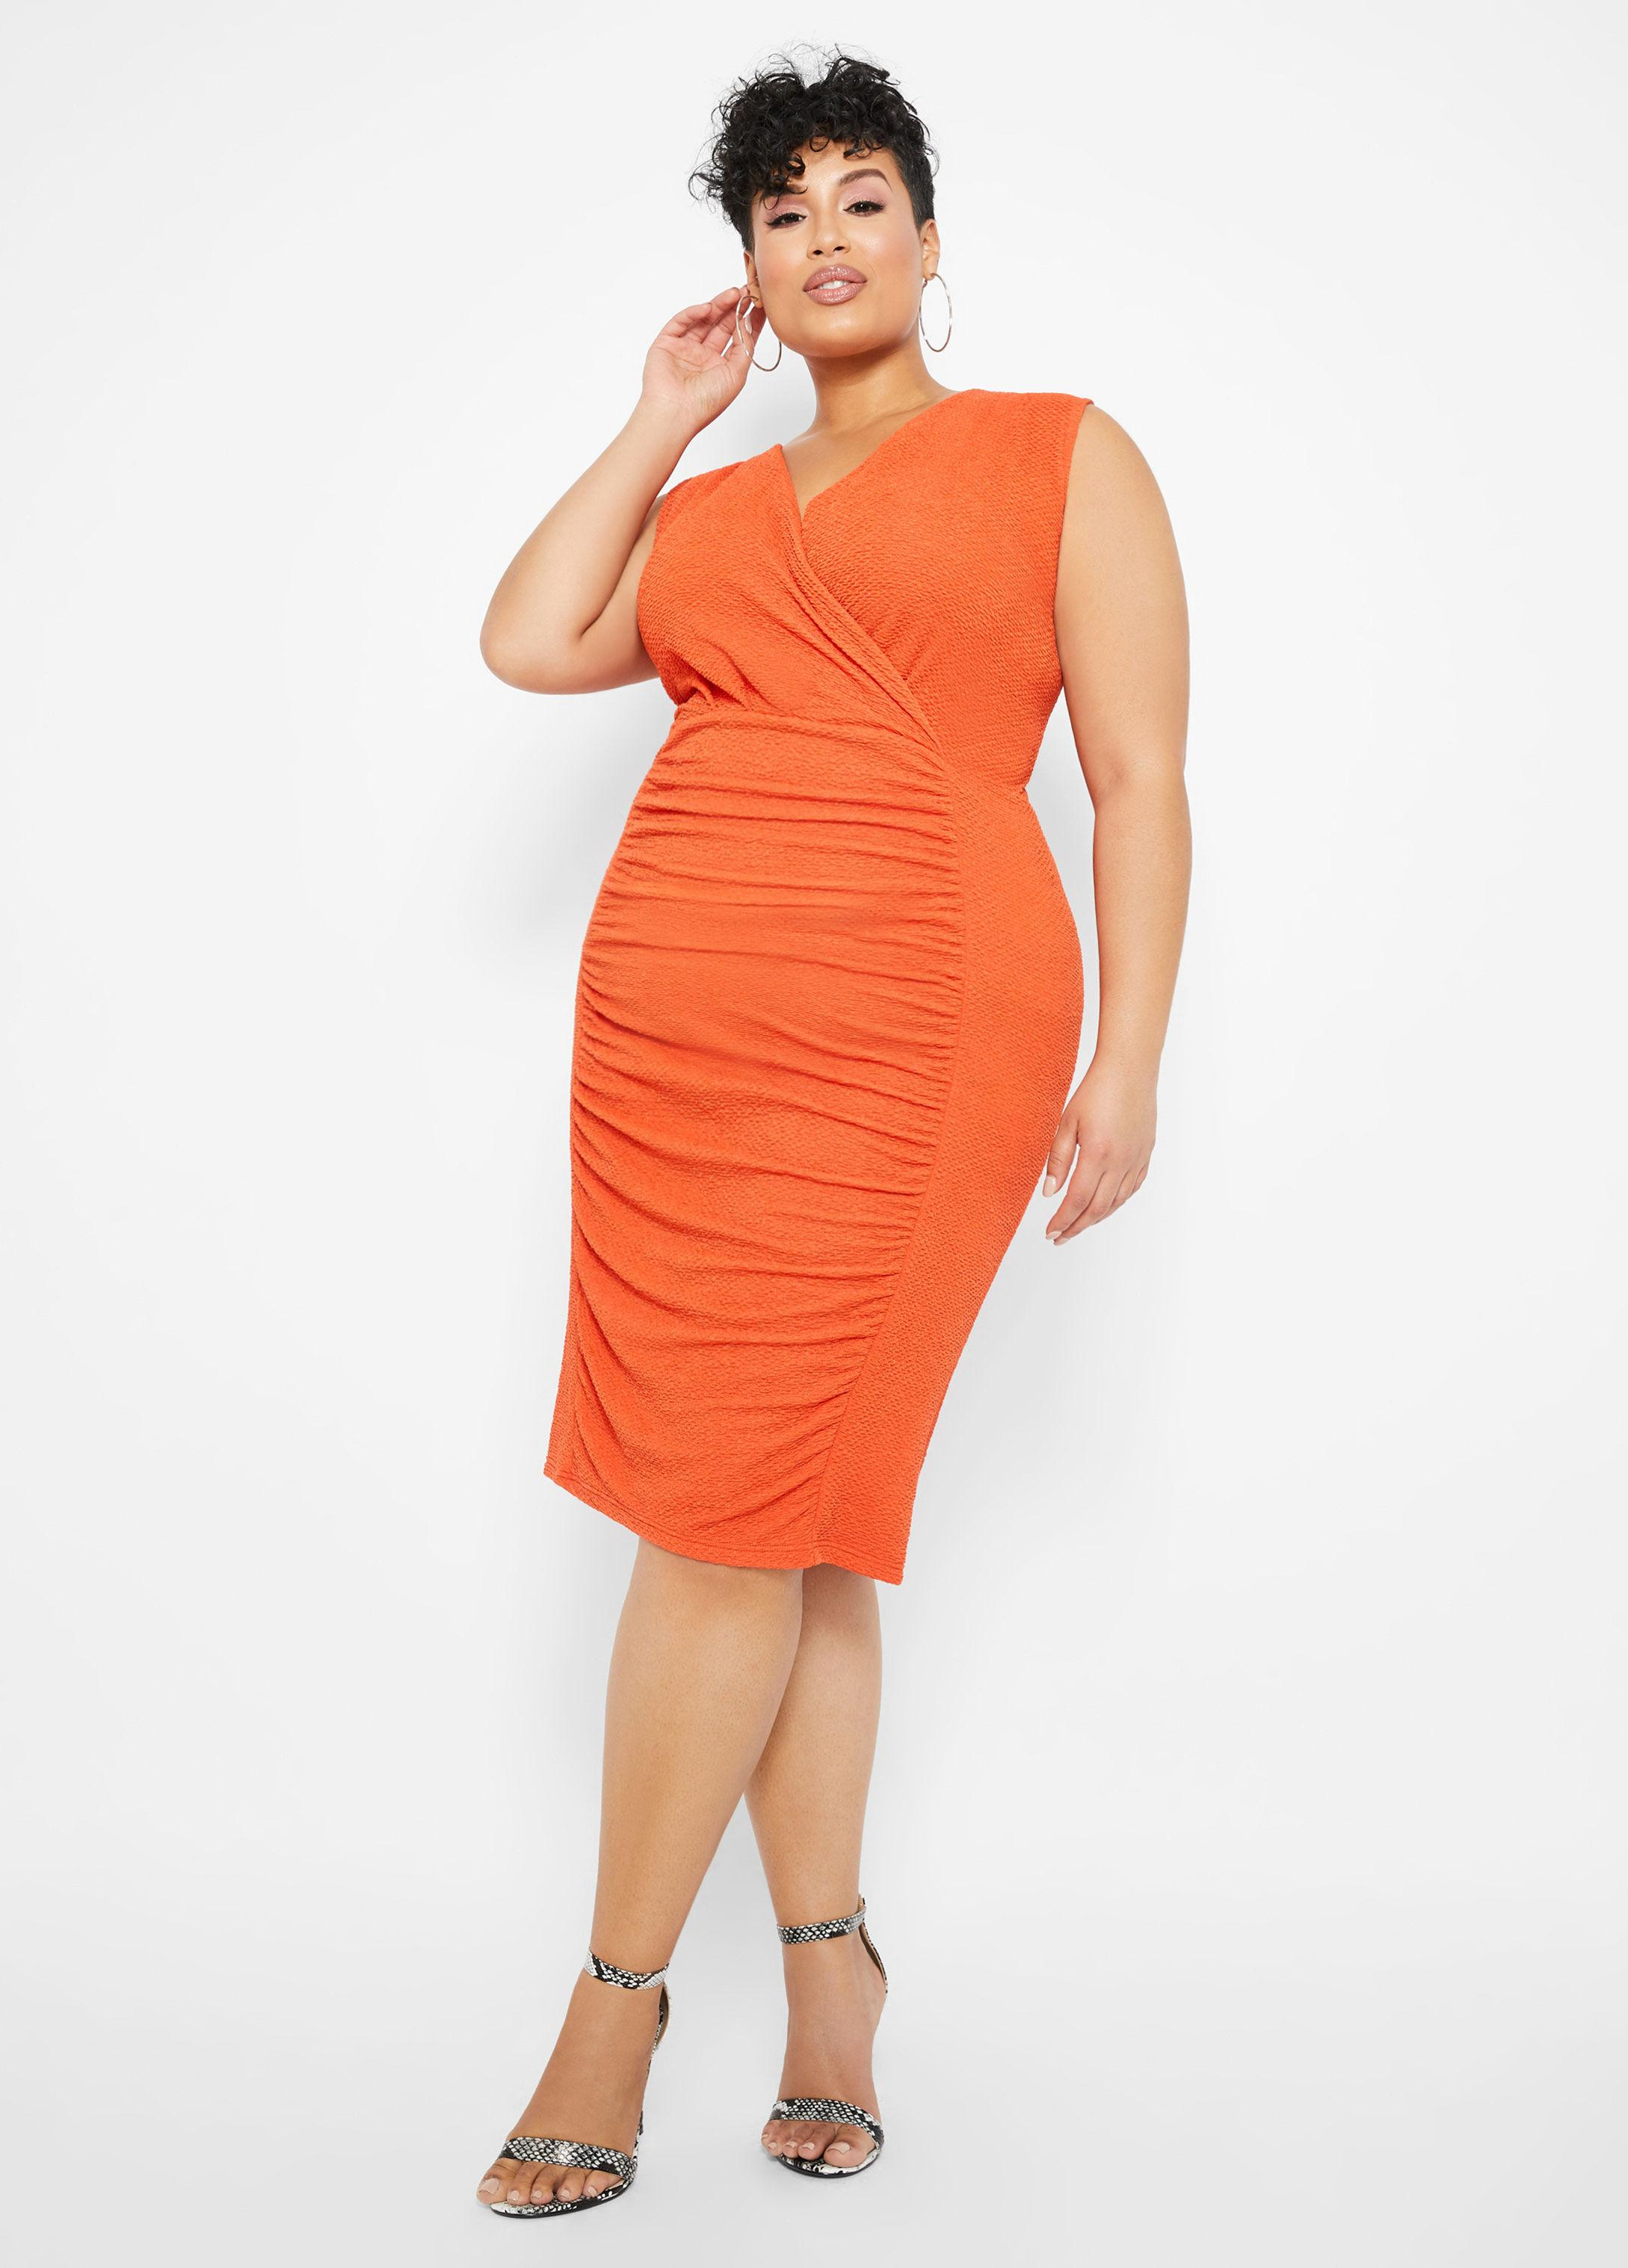 6078ff44ad Lyst - Ashley Stewart Plus Size Fashion Without Limits By Emme ...